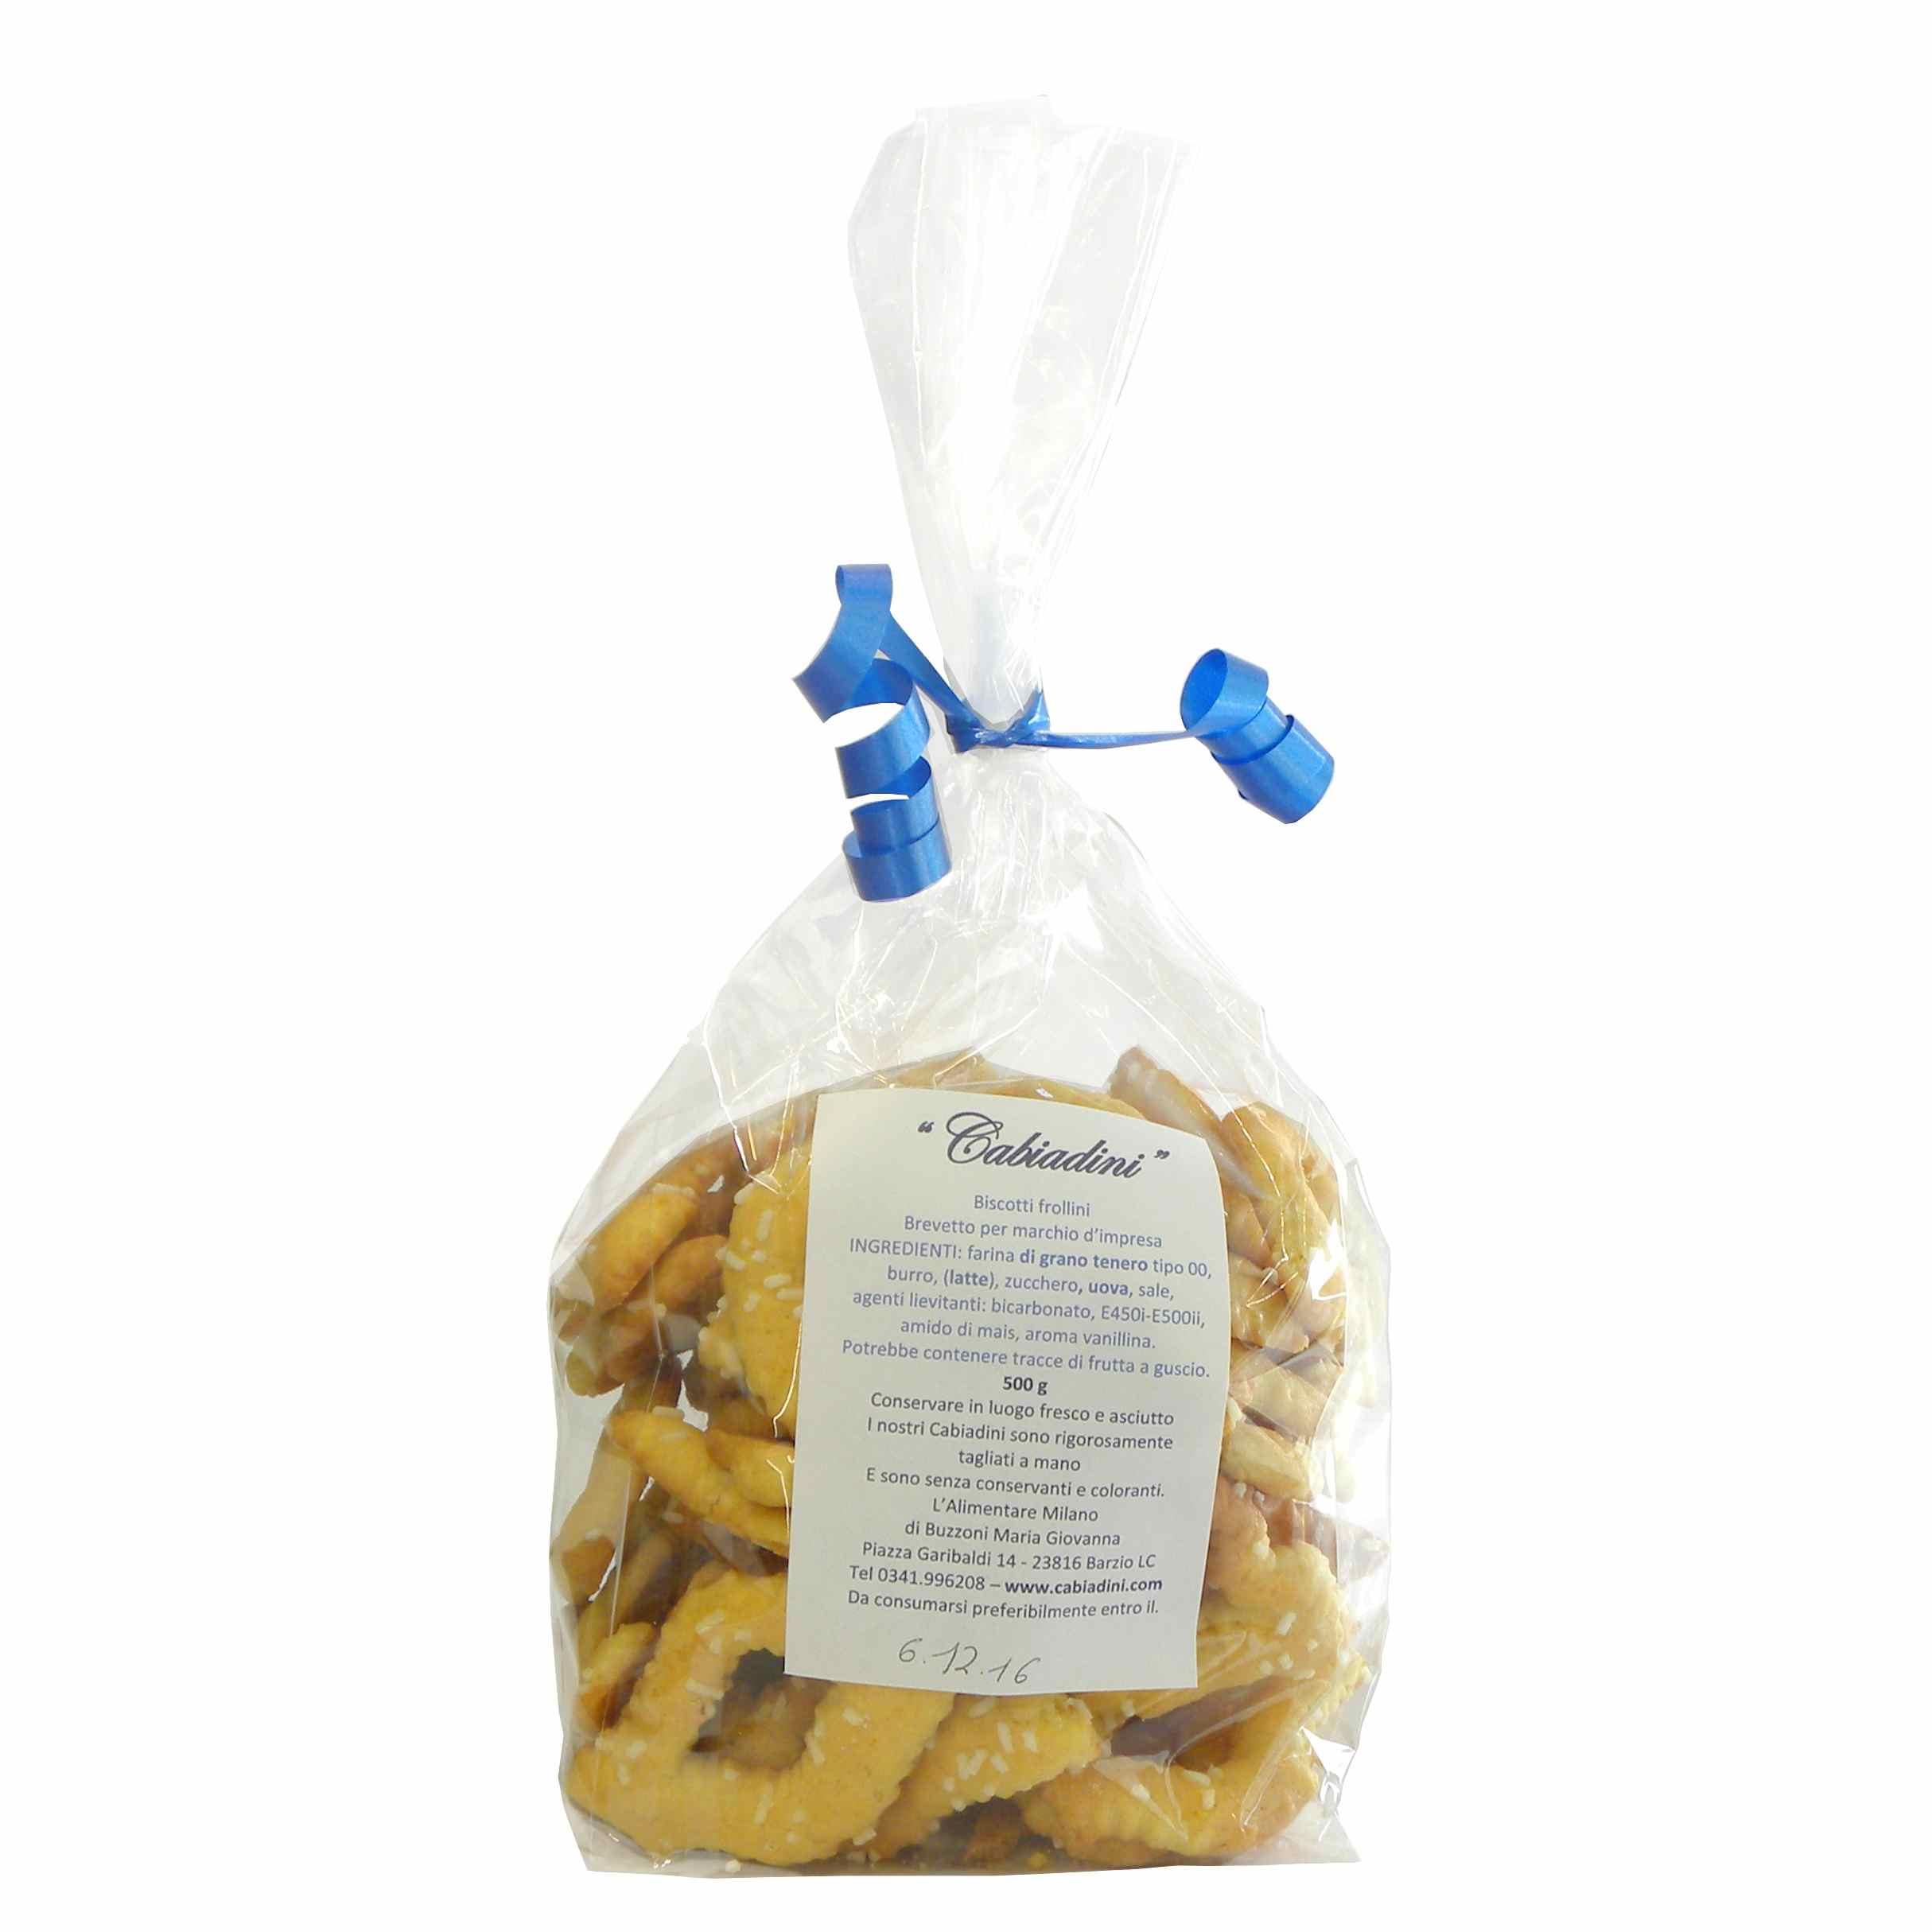 Cabiadini cookies – Italian biscuits – best Italian food – Gustorotondo online food shop – authentic Italian artisan food online